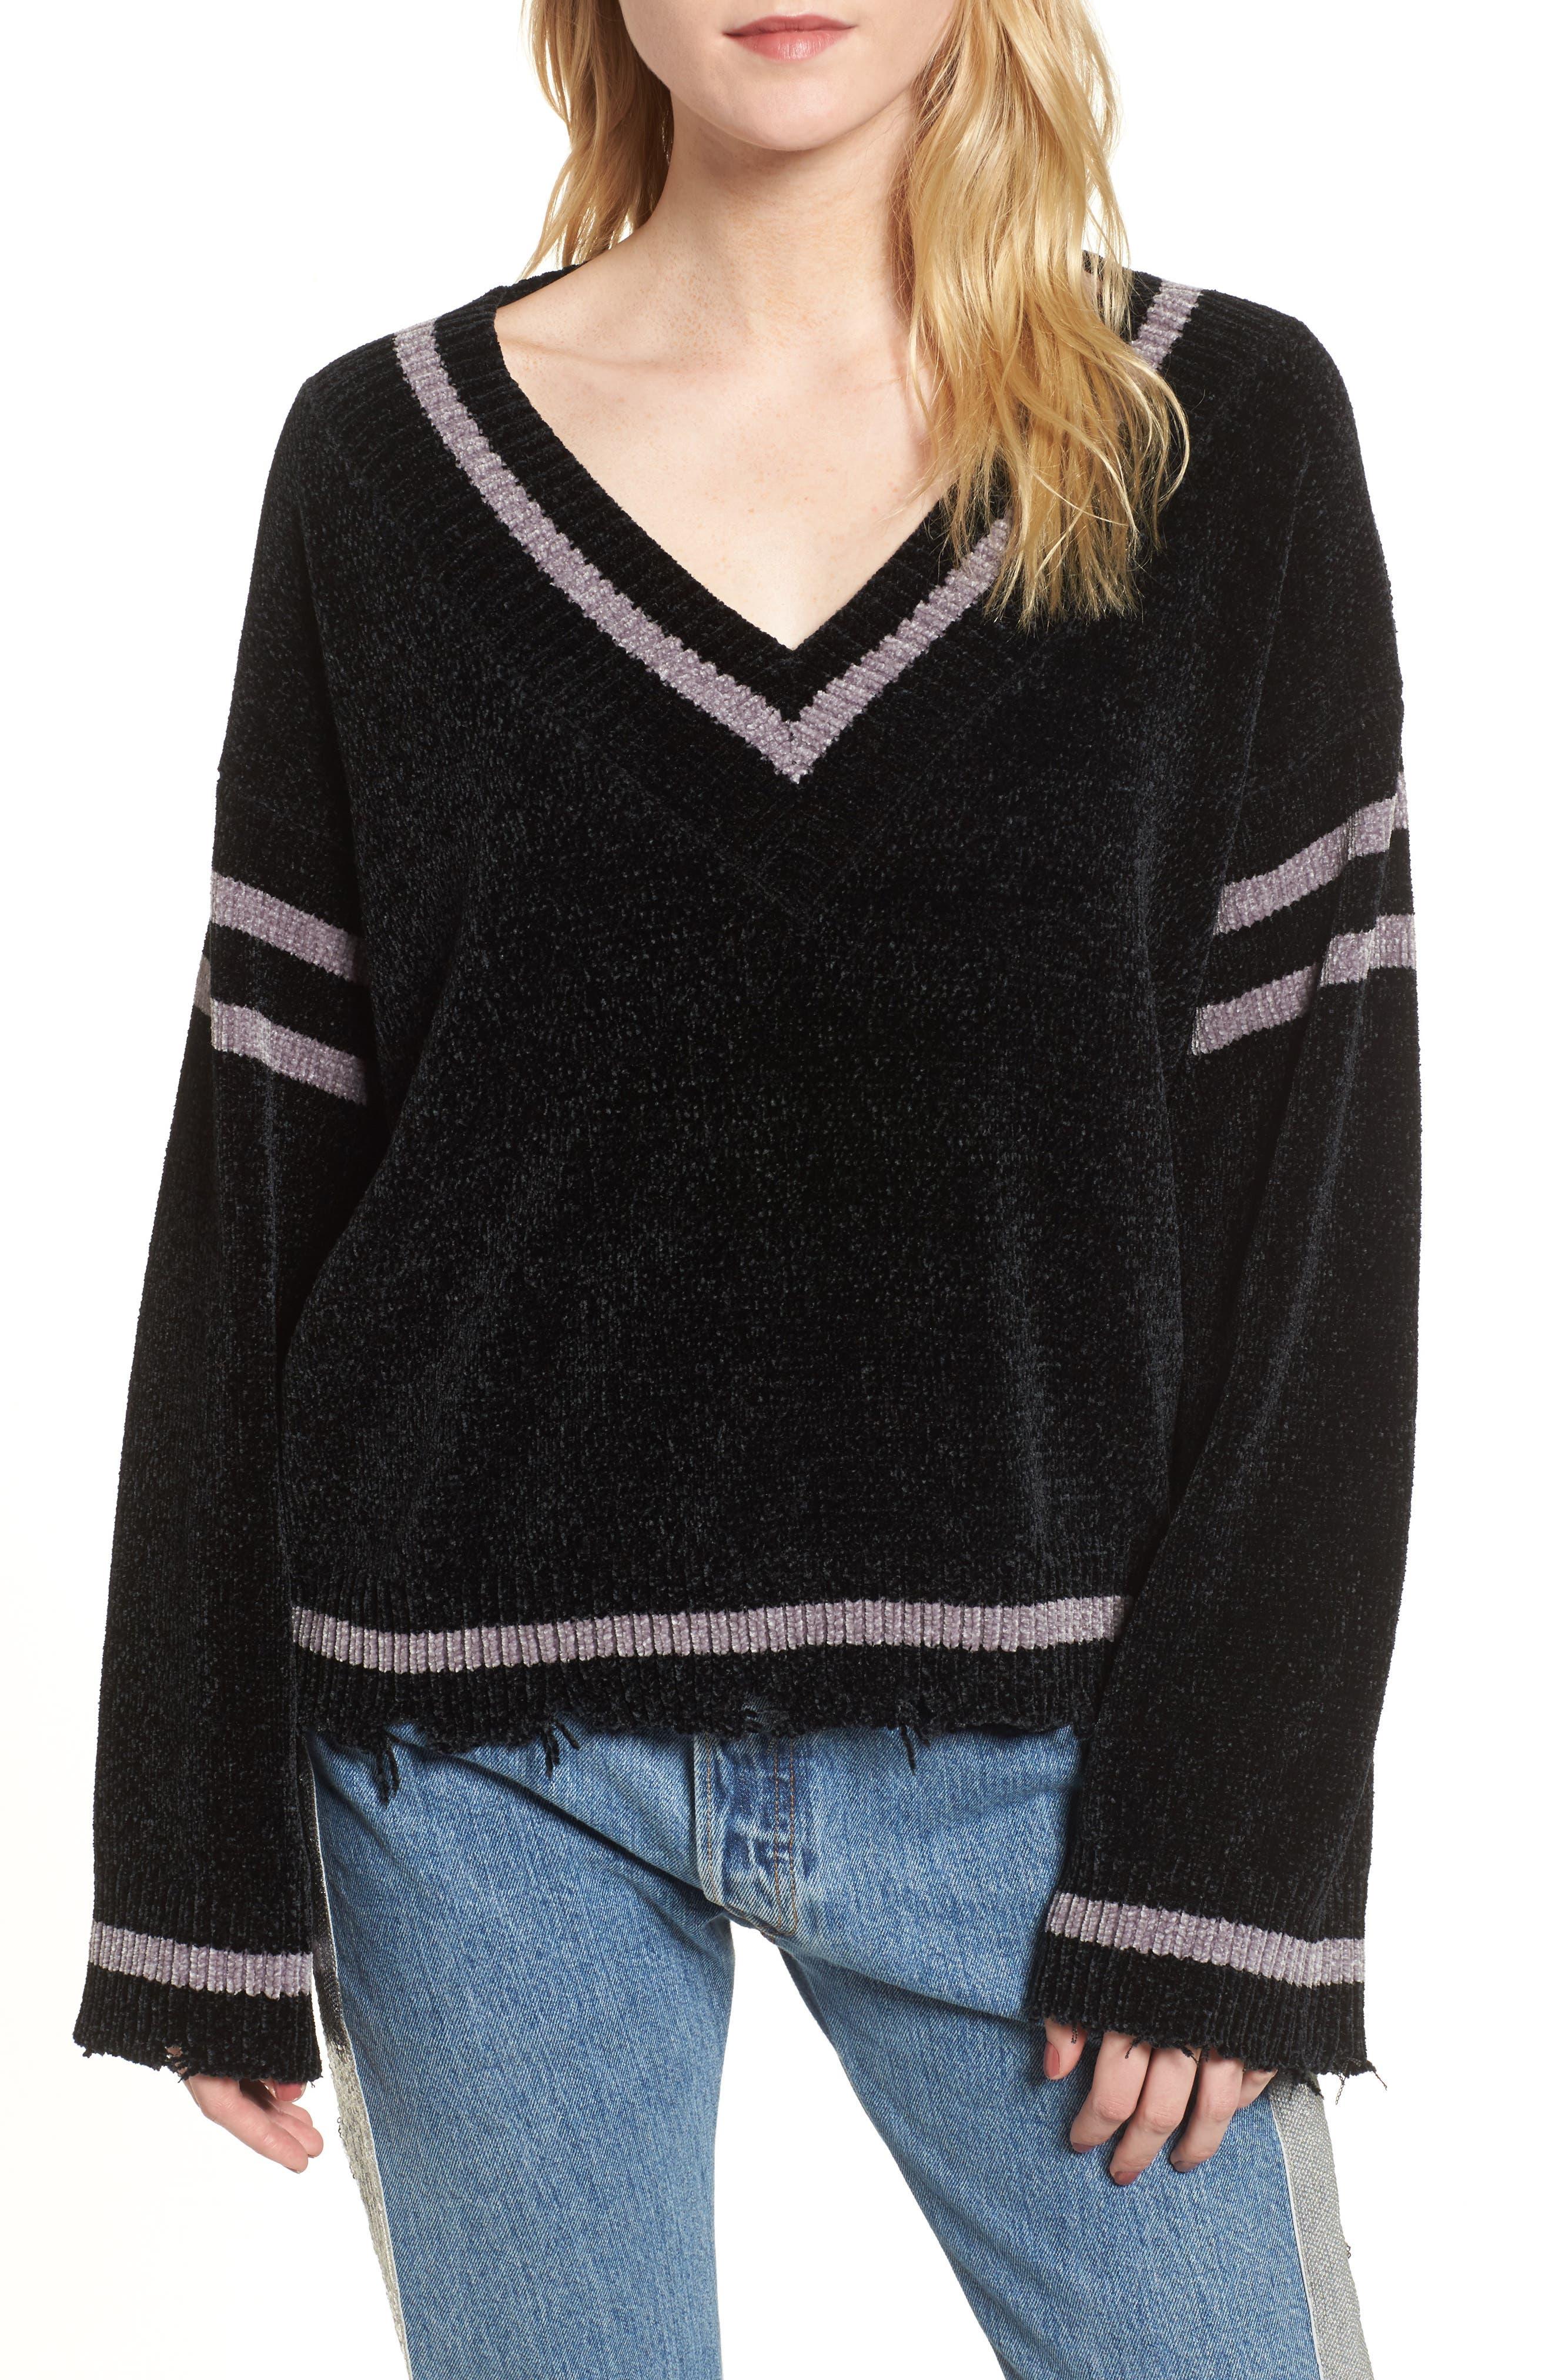 Oversize V-Neck Sweater,                             Main thumbnail 1, color,                             BLACK/ MED. HEATHER GREY